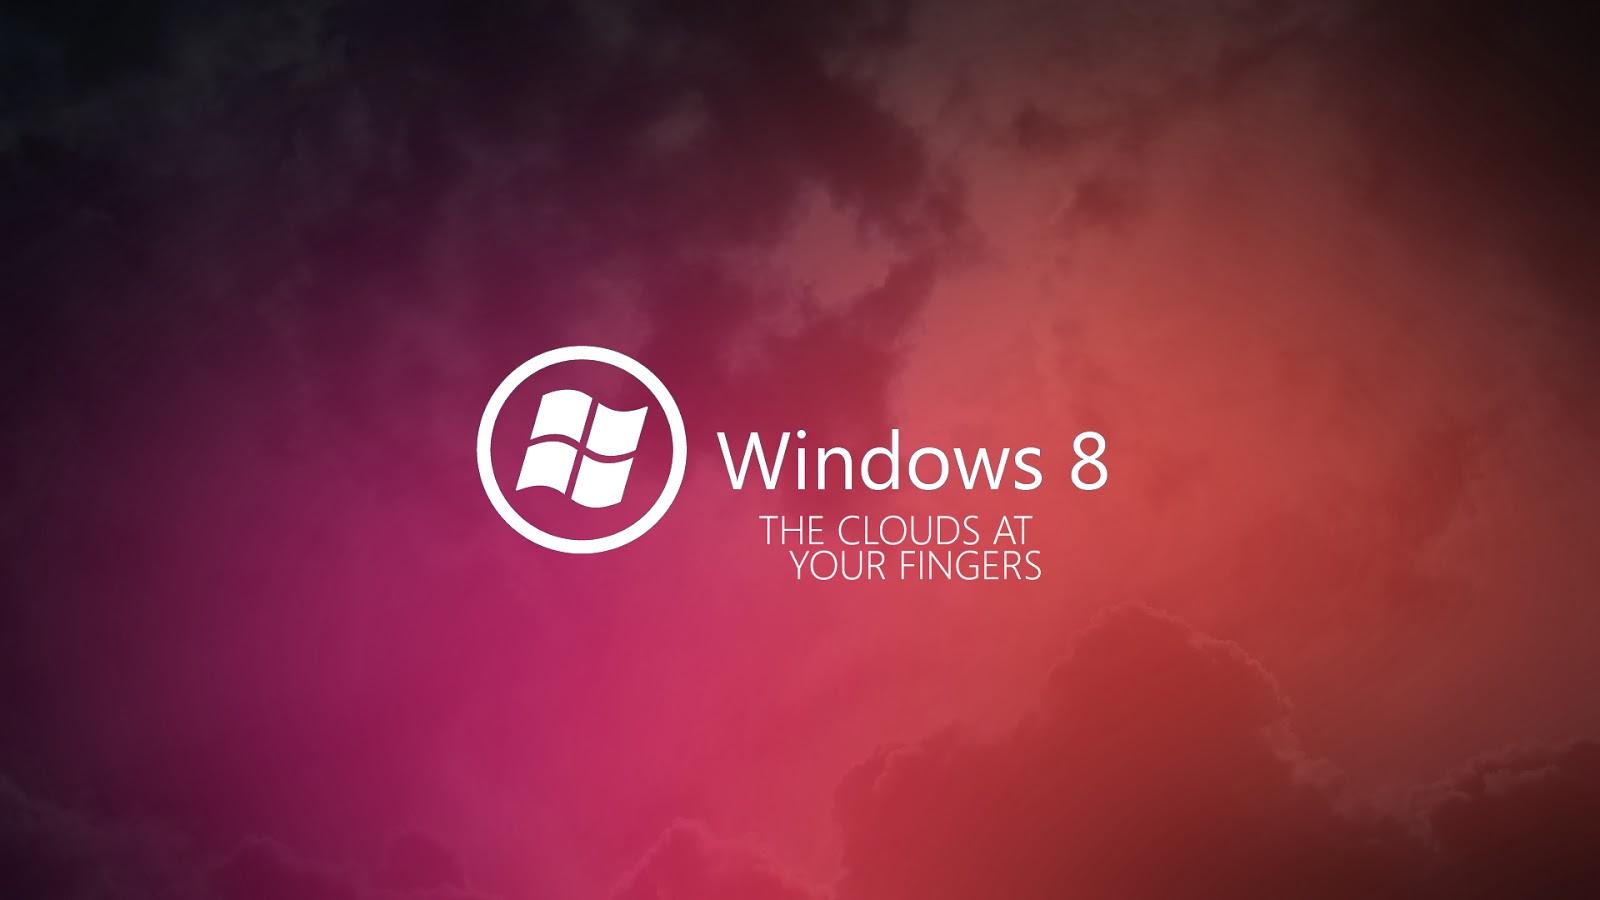 HD Wallpapers 1080p windows 8 | Nice Pics Gallery